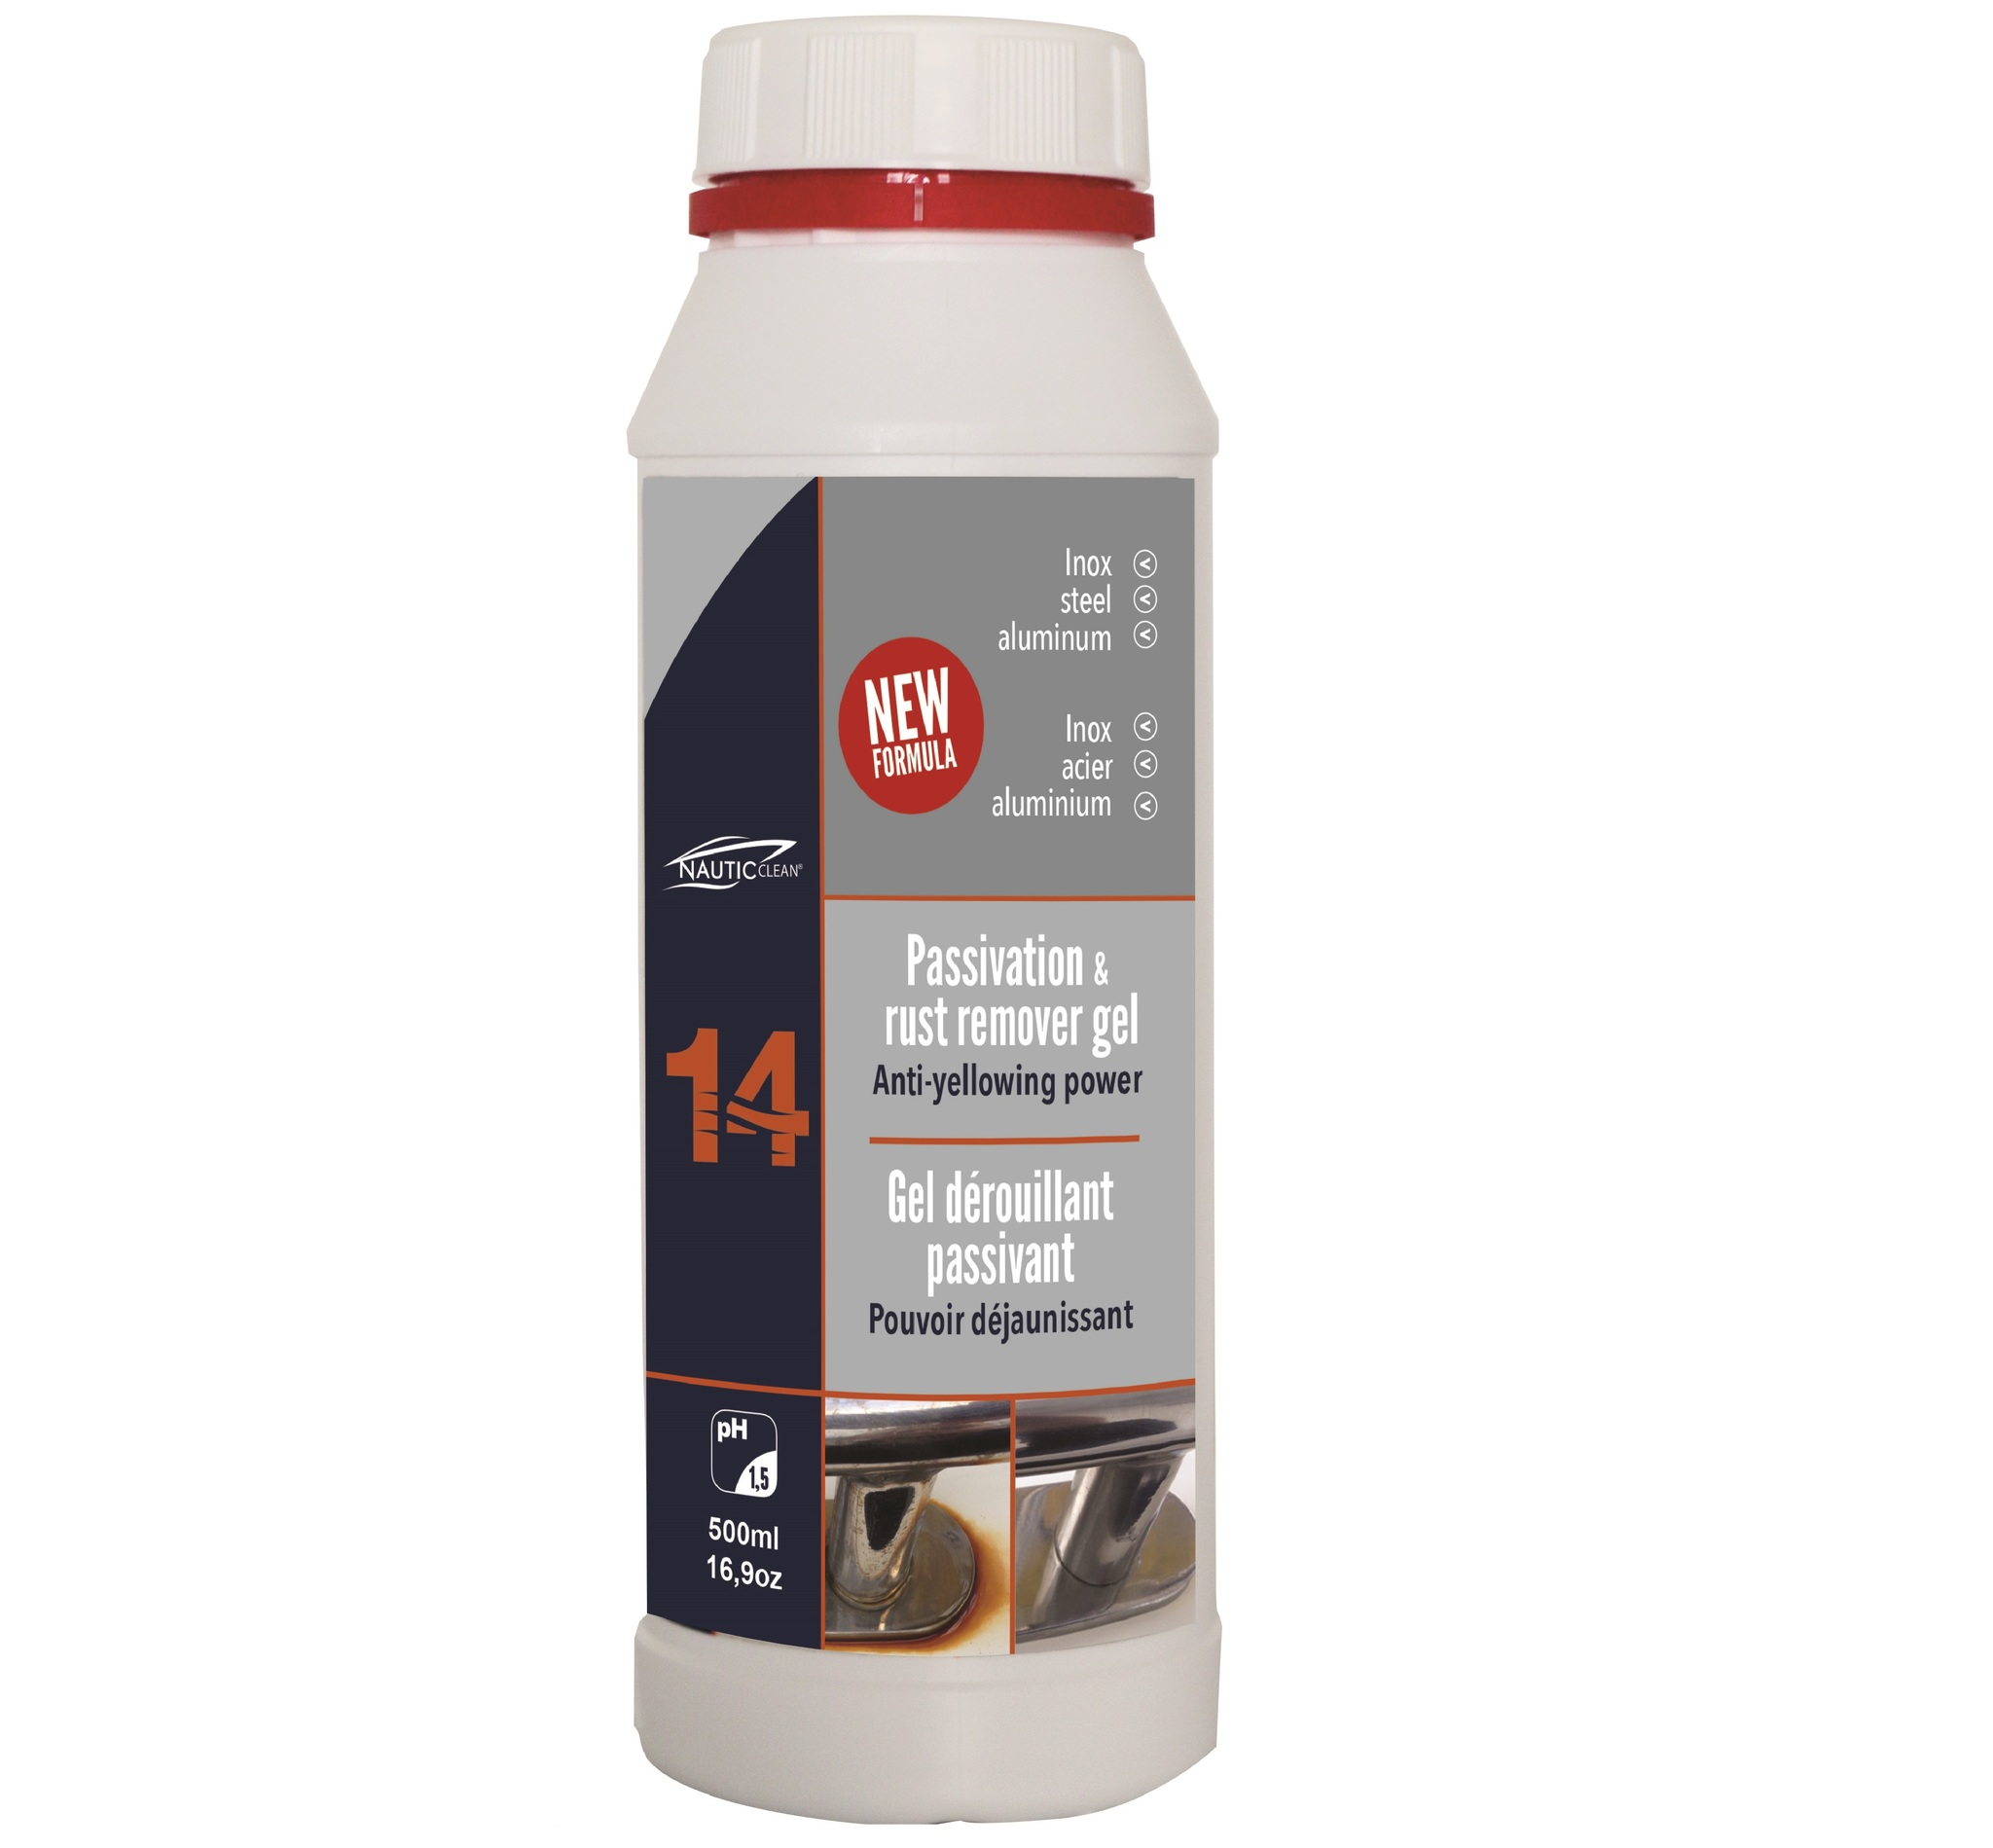 Passivation & rust remover gel №14